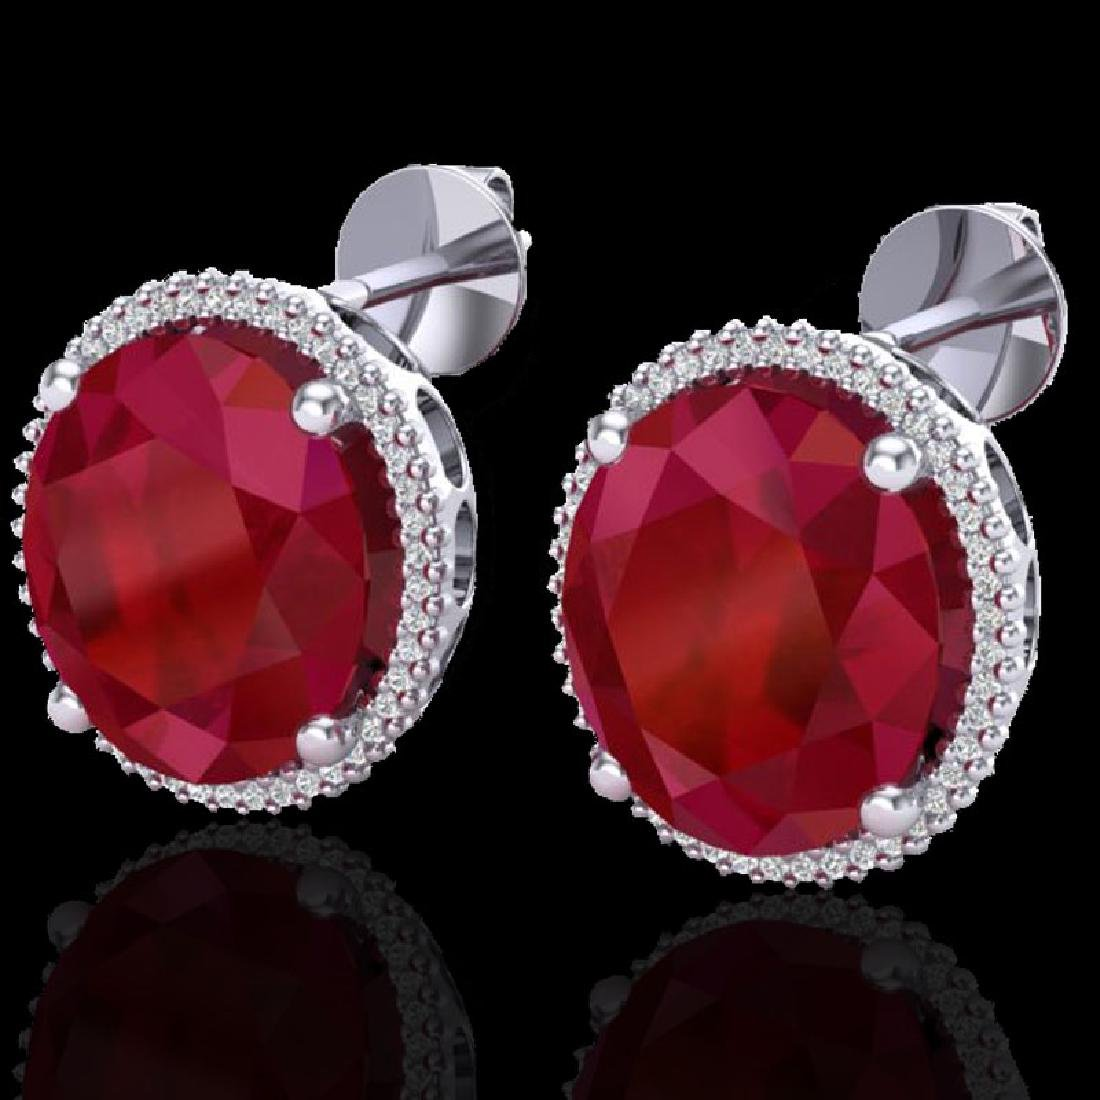 25 CTW Ruby & Micro Pave VS/SI Diamond Halo Earrings